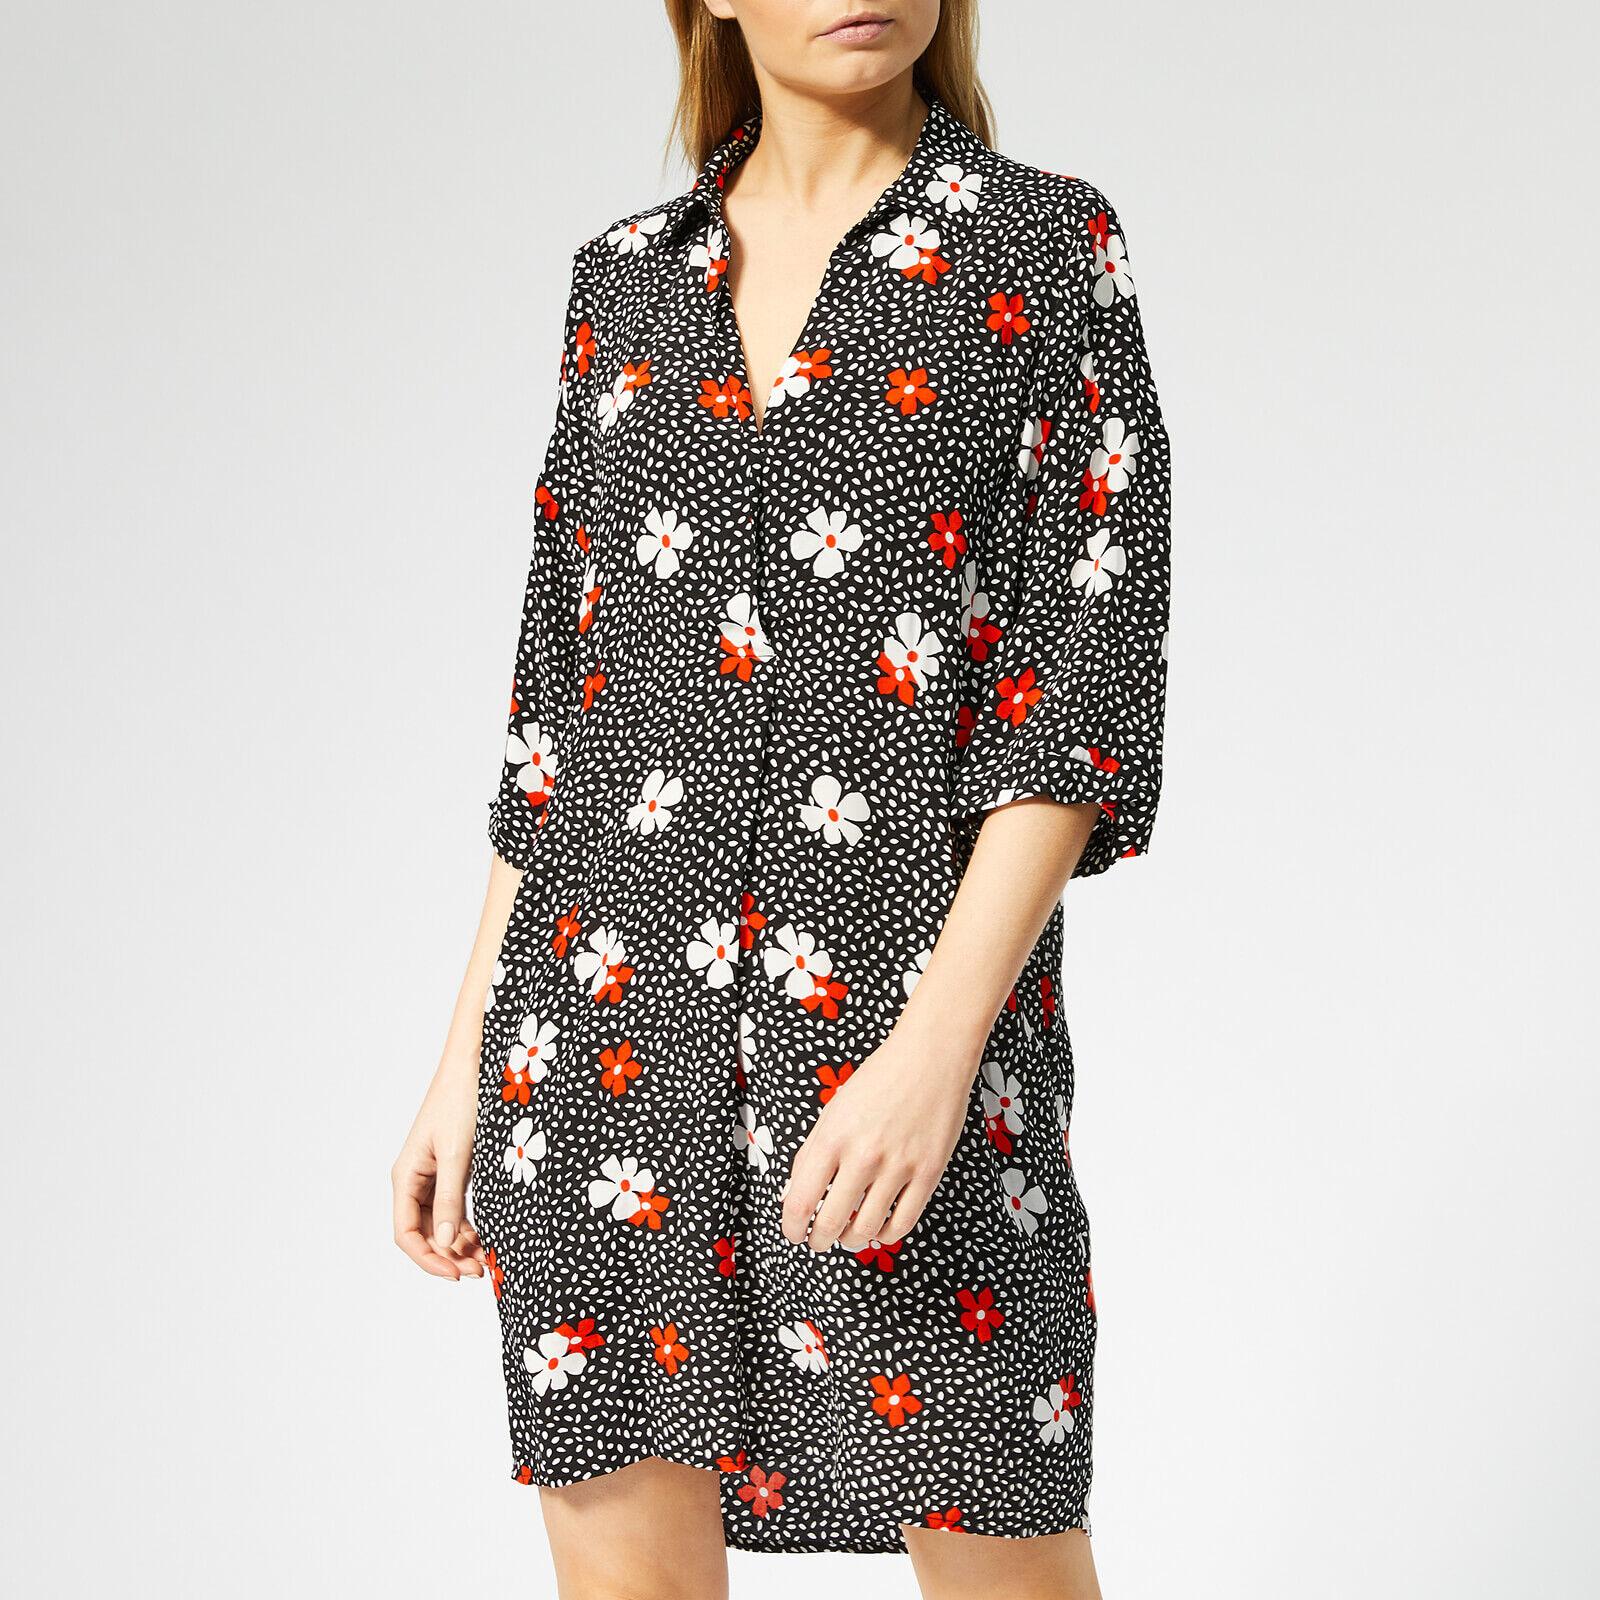 Whistles Women's Lola Confetti Floral Print Dress - Black/Multi - XS - Black